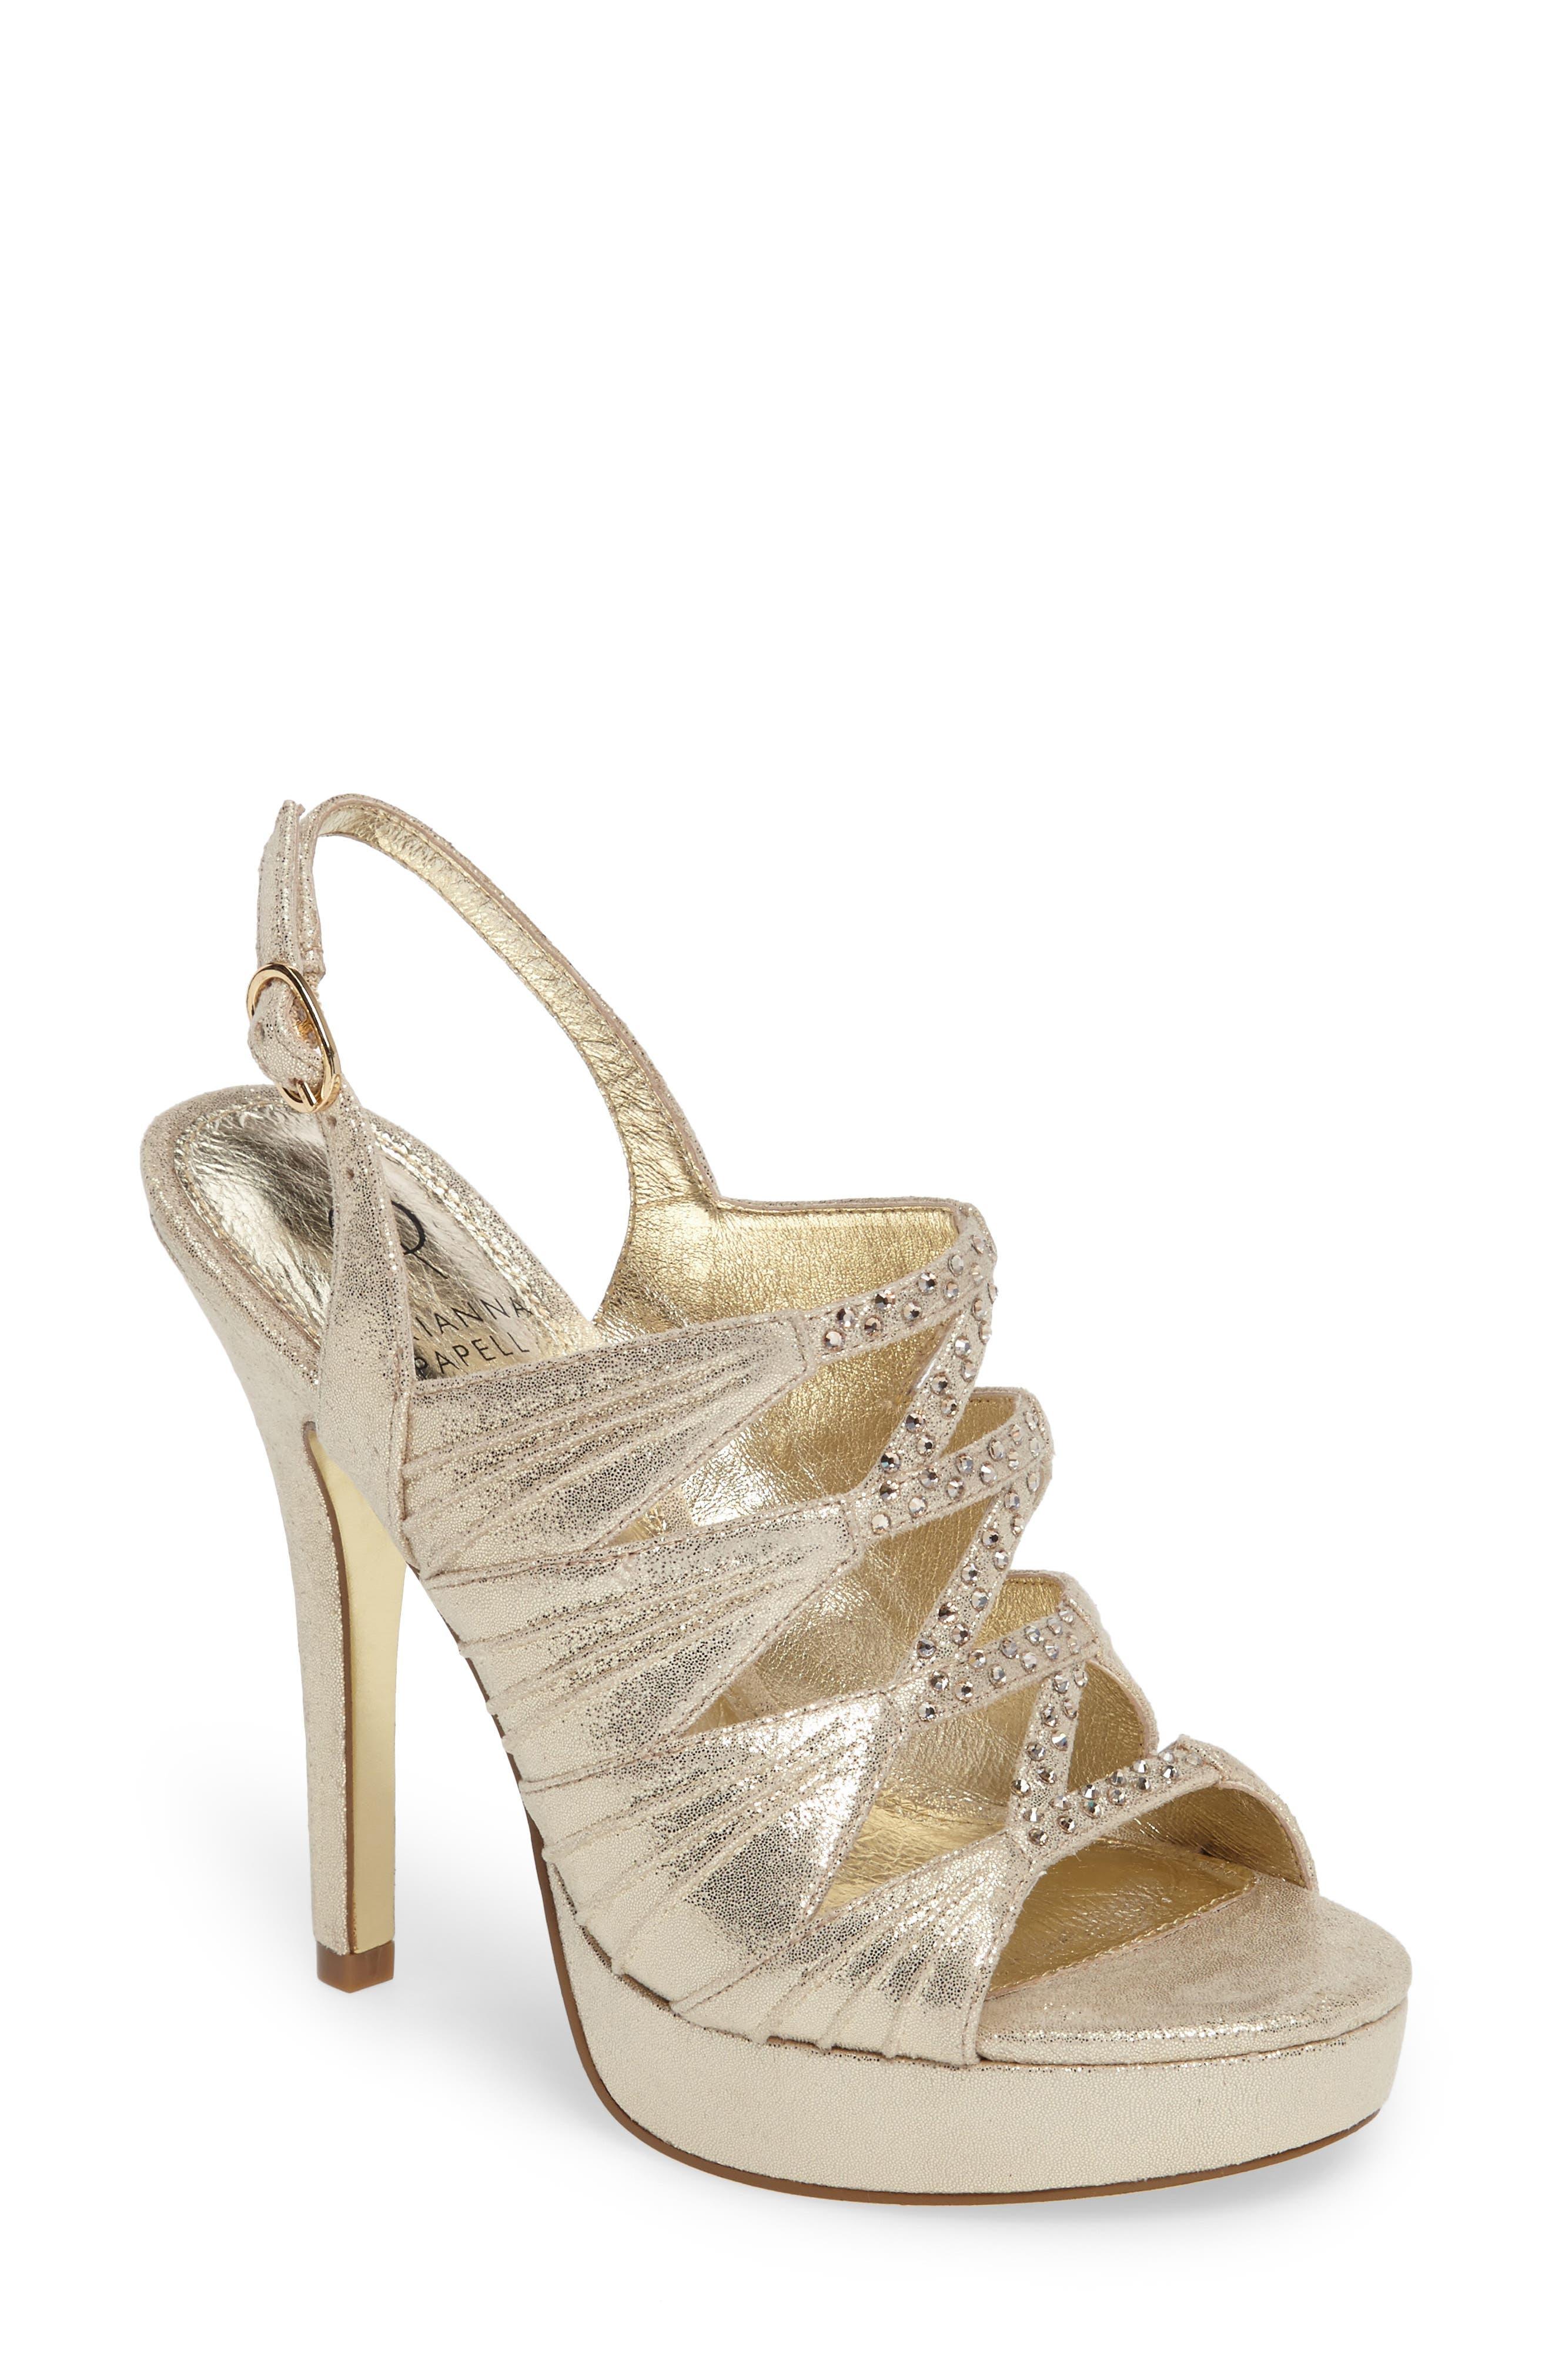 Alternate Image 1 Selected - Adrianna Pappell Marissa Platform Sandal (Women)